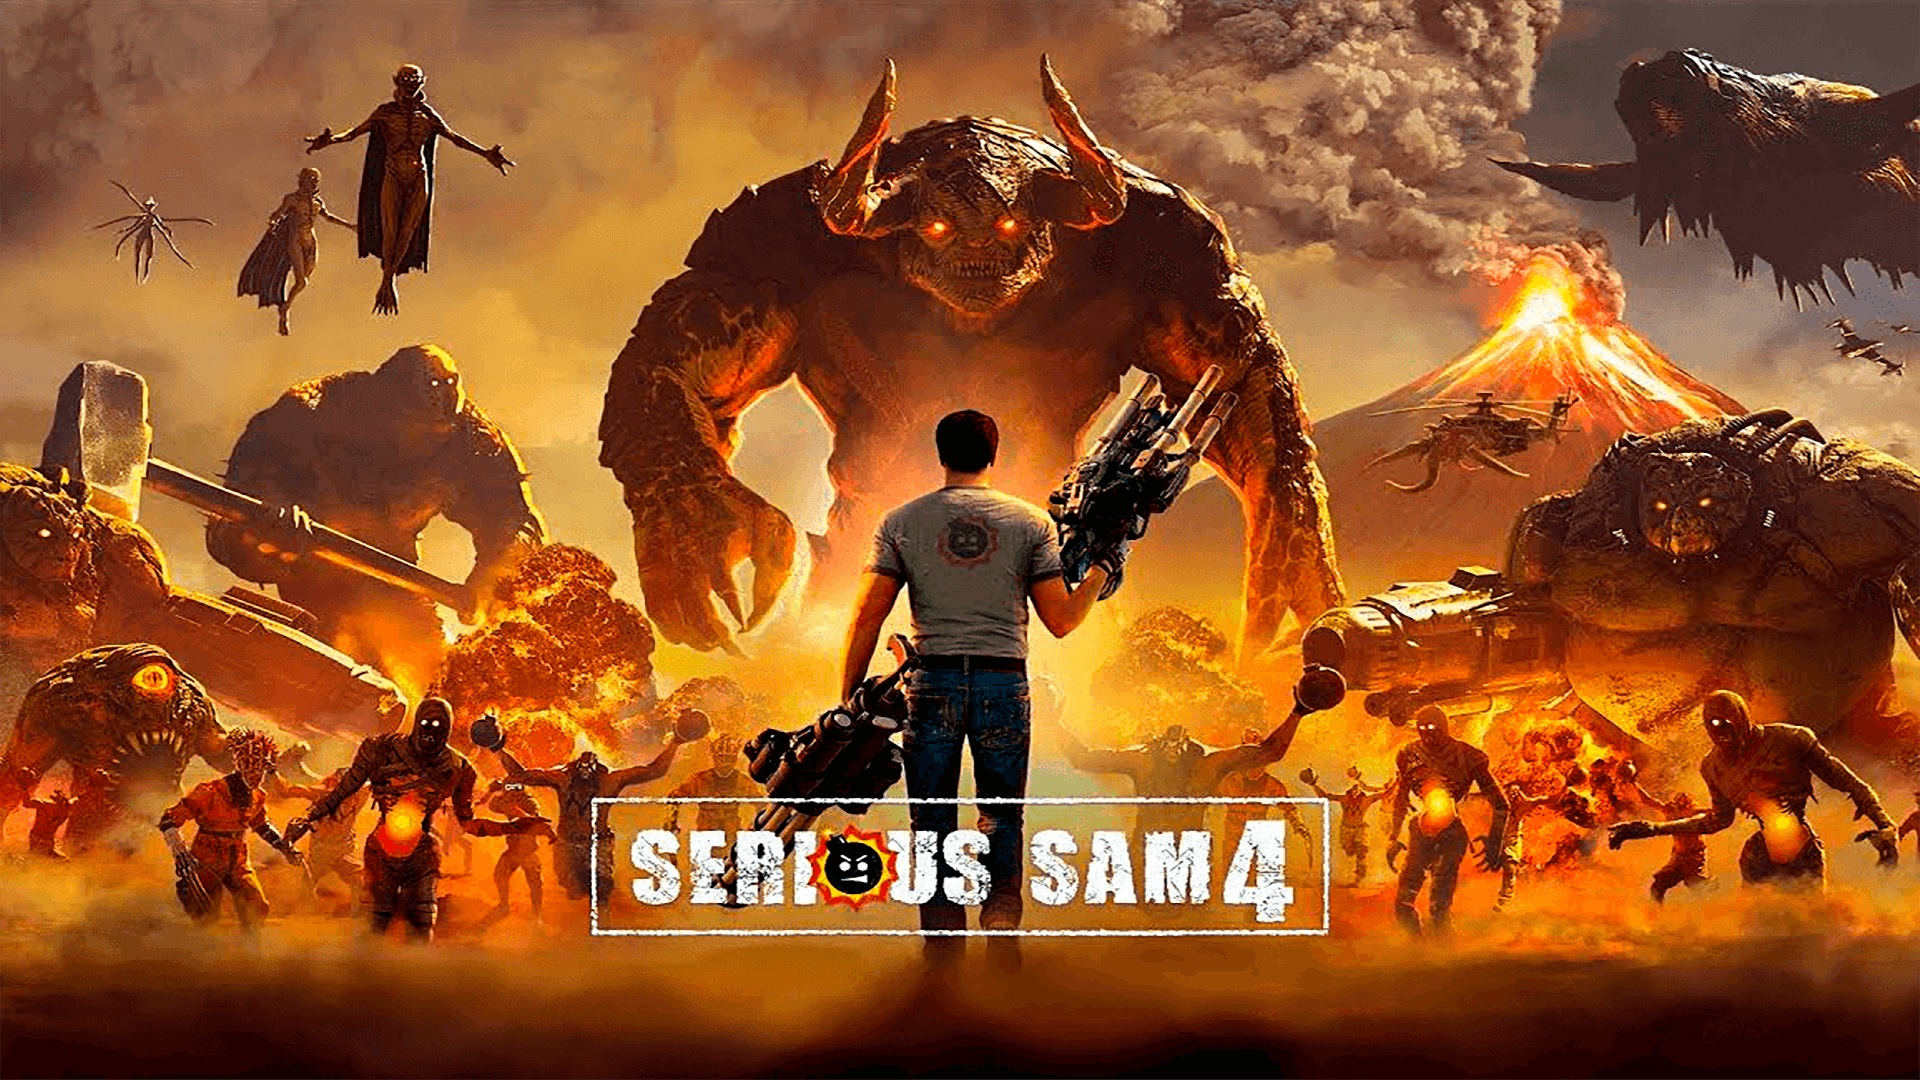 Serious Sam 4 Poster